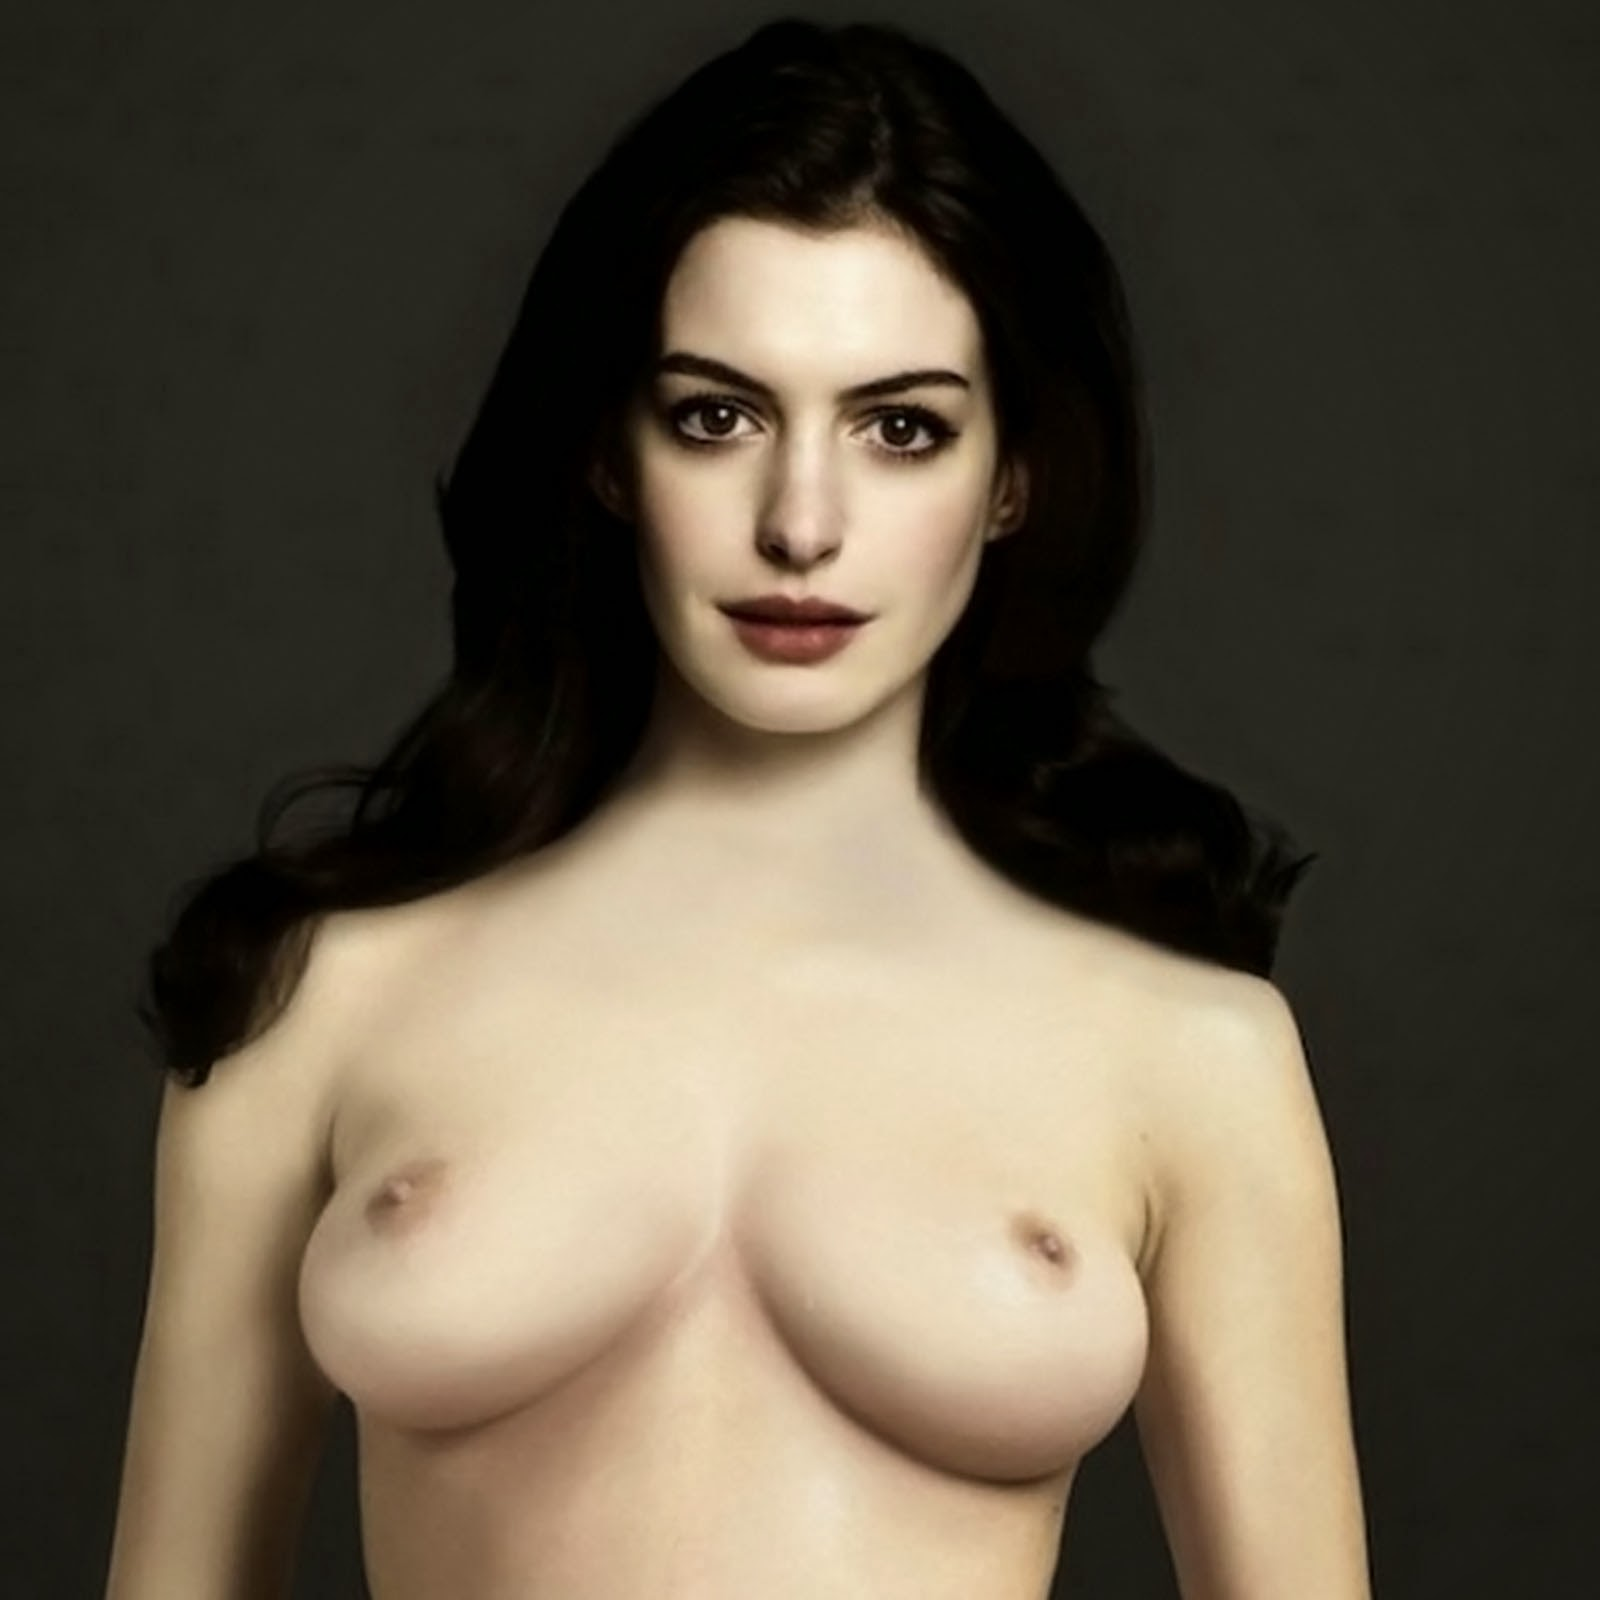 Veronique genest nue centerblog XXX